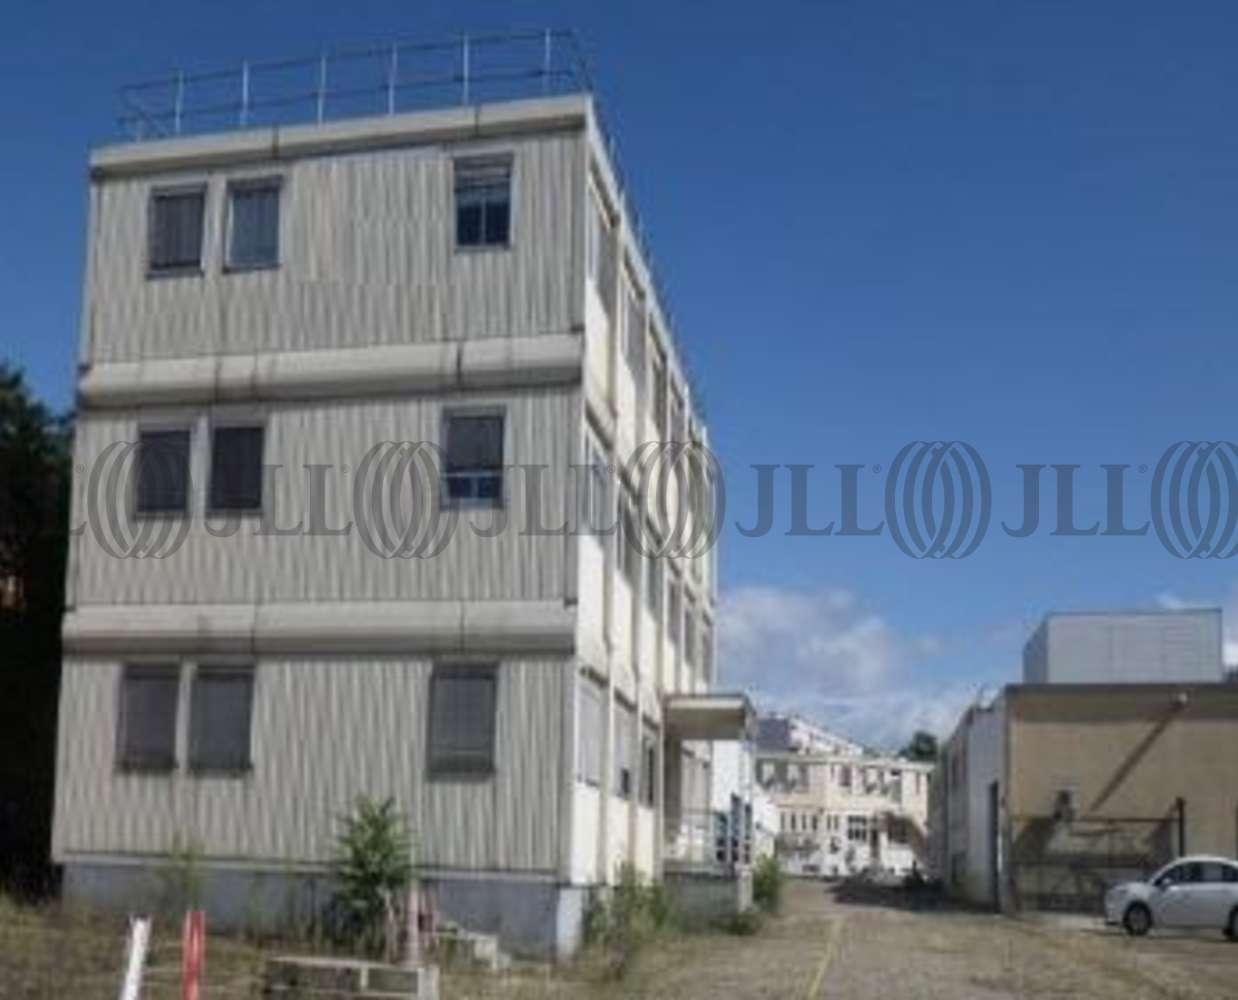 Activités/entrepôt Aubervilliers, 93300 - 95 BOULEVARD FELIX FAURE